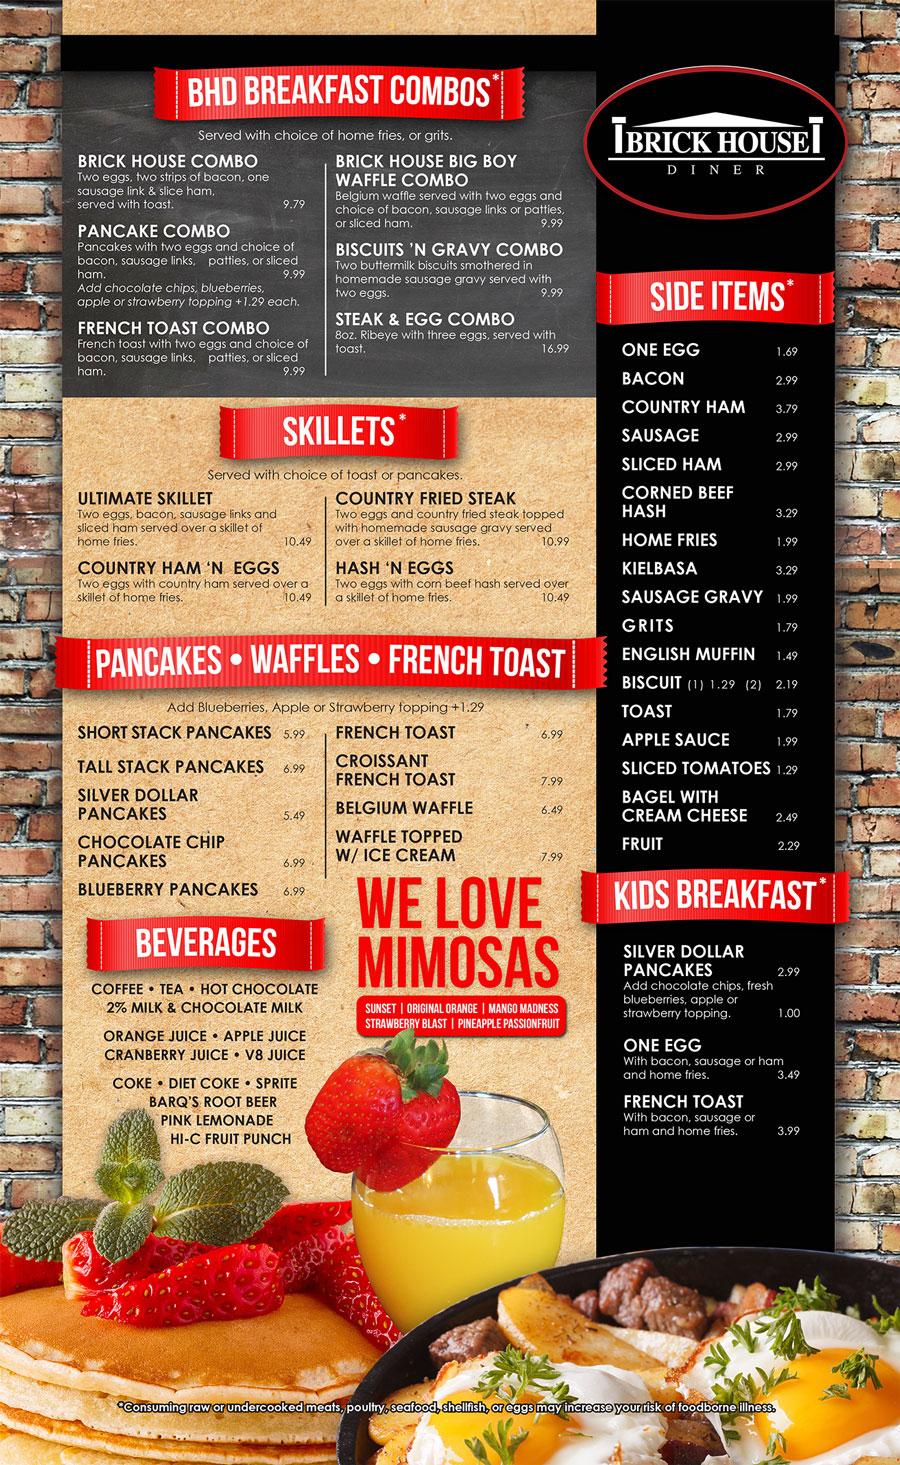 Brick-House-Diner-VB-Breakfast-web-2